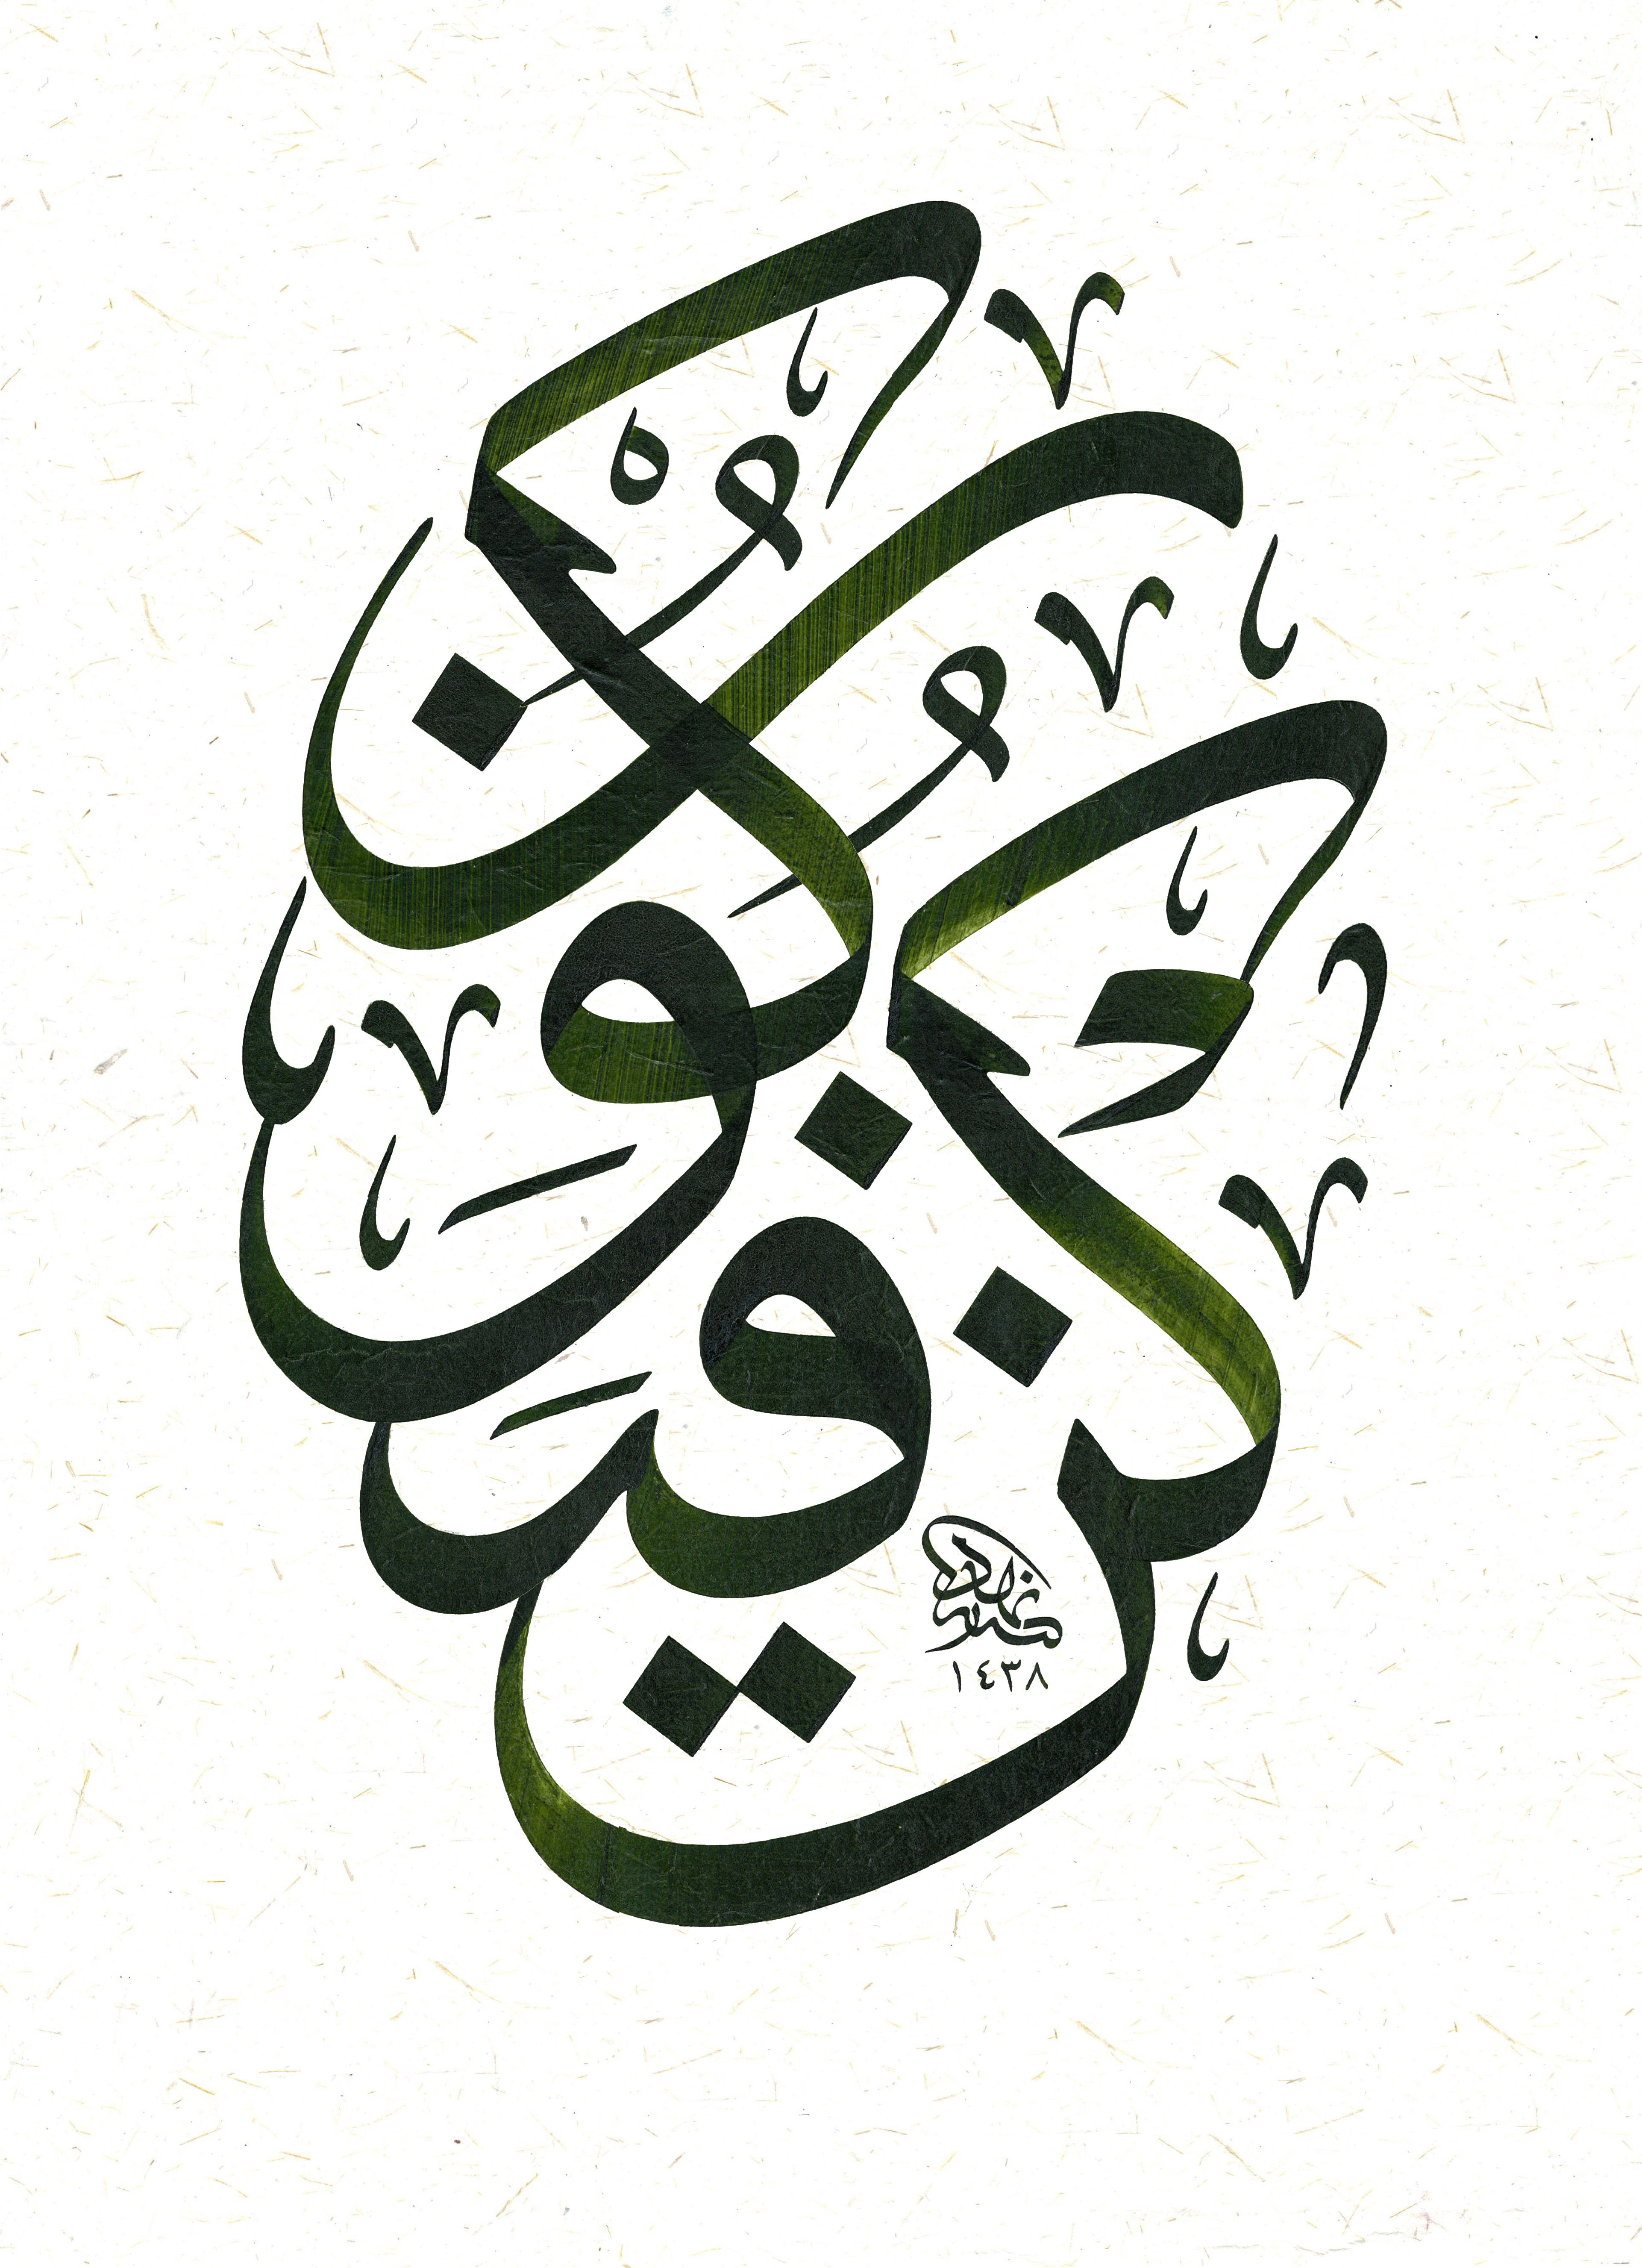 Pin By Baki Kahraman On My Calligraphy Islamic Caligraphy Art Arabic Calligraphy Art Islamic Art Calligraphy